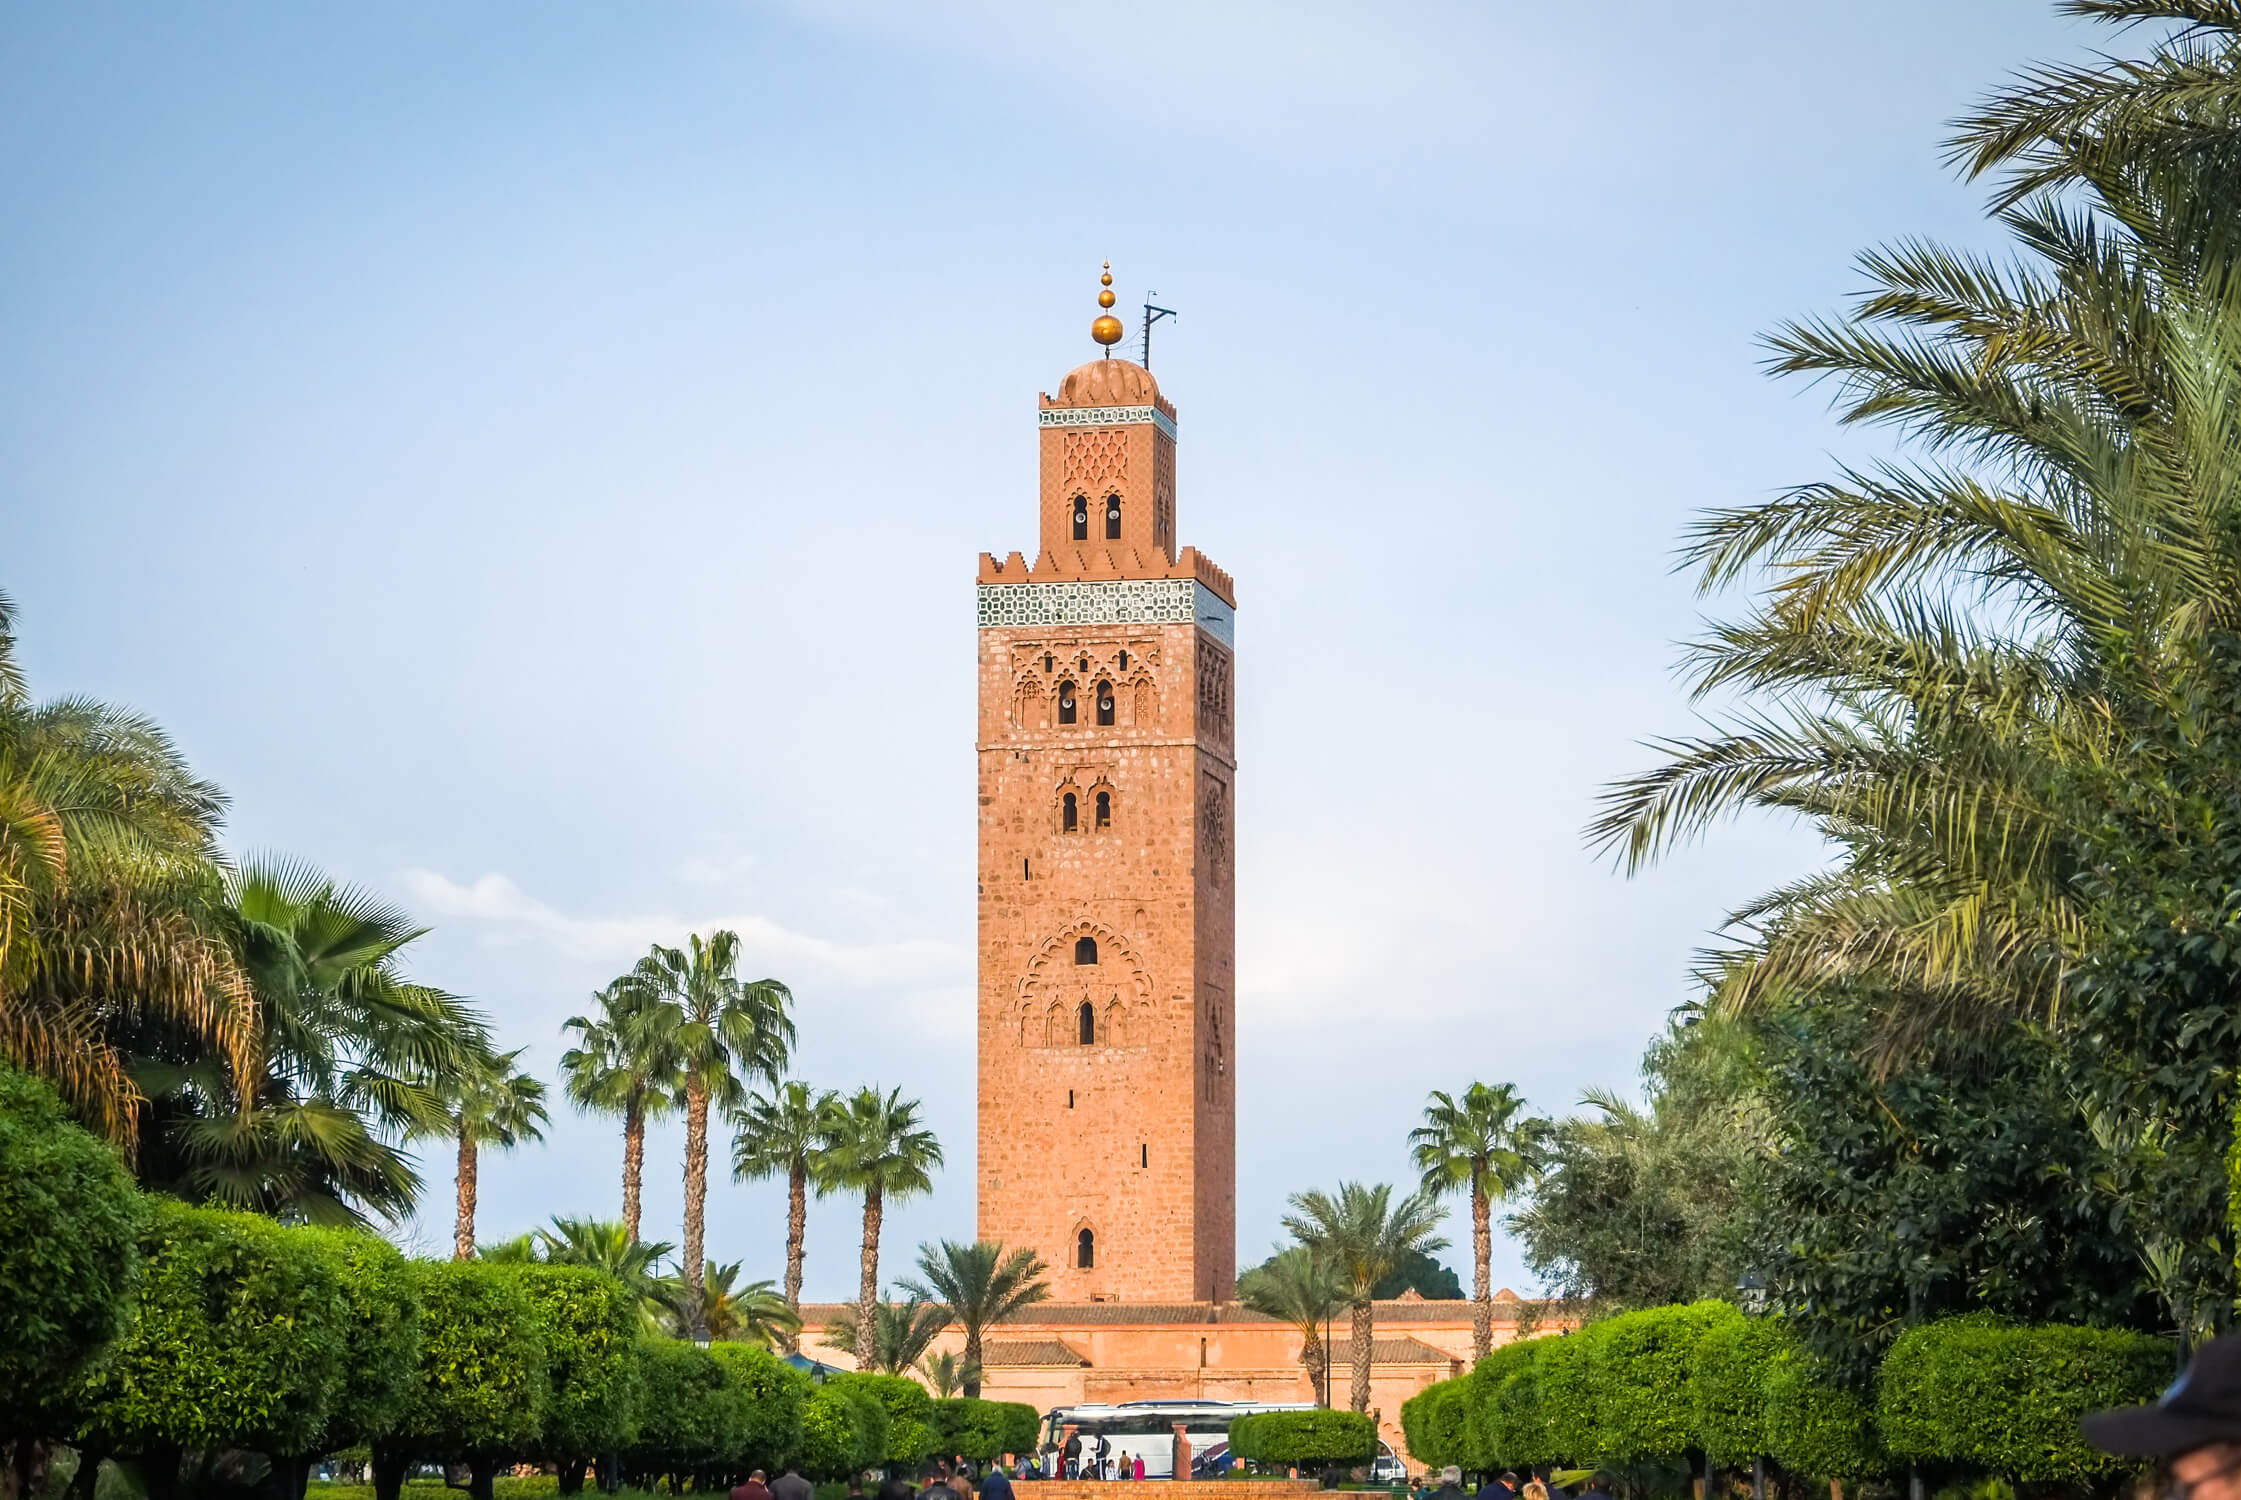 Découvrez Marrakech, Ouarzazate, Désert de Merzouga, Essaouira